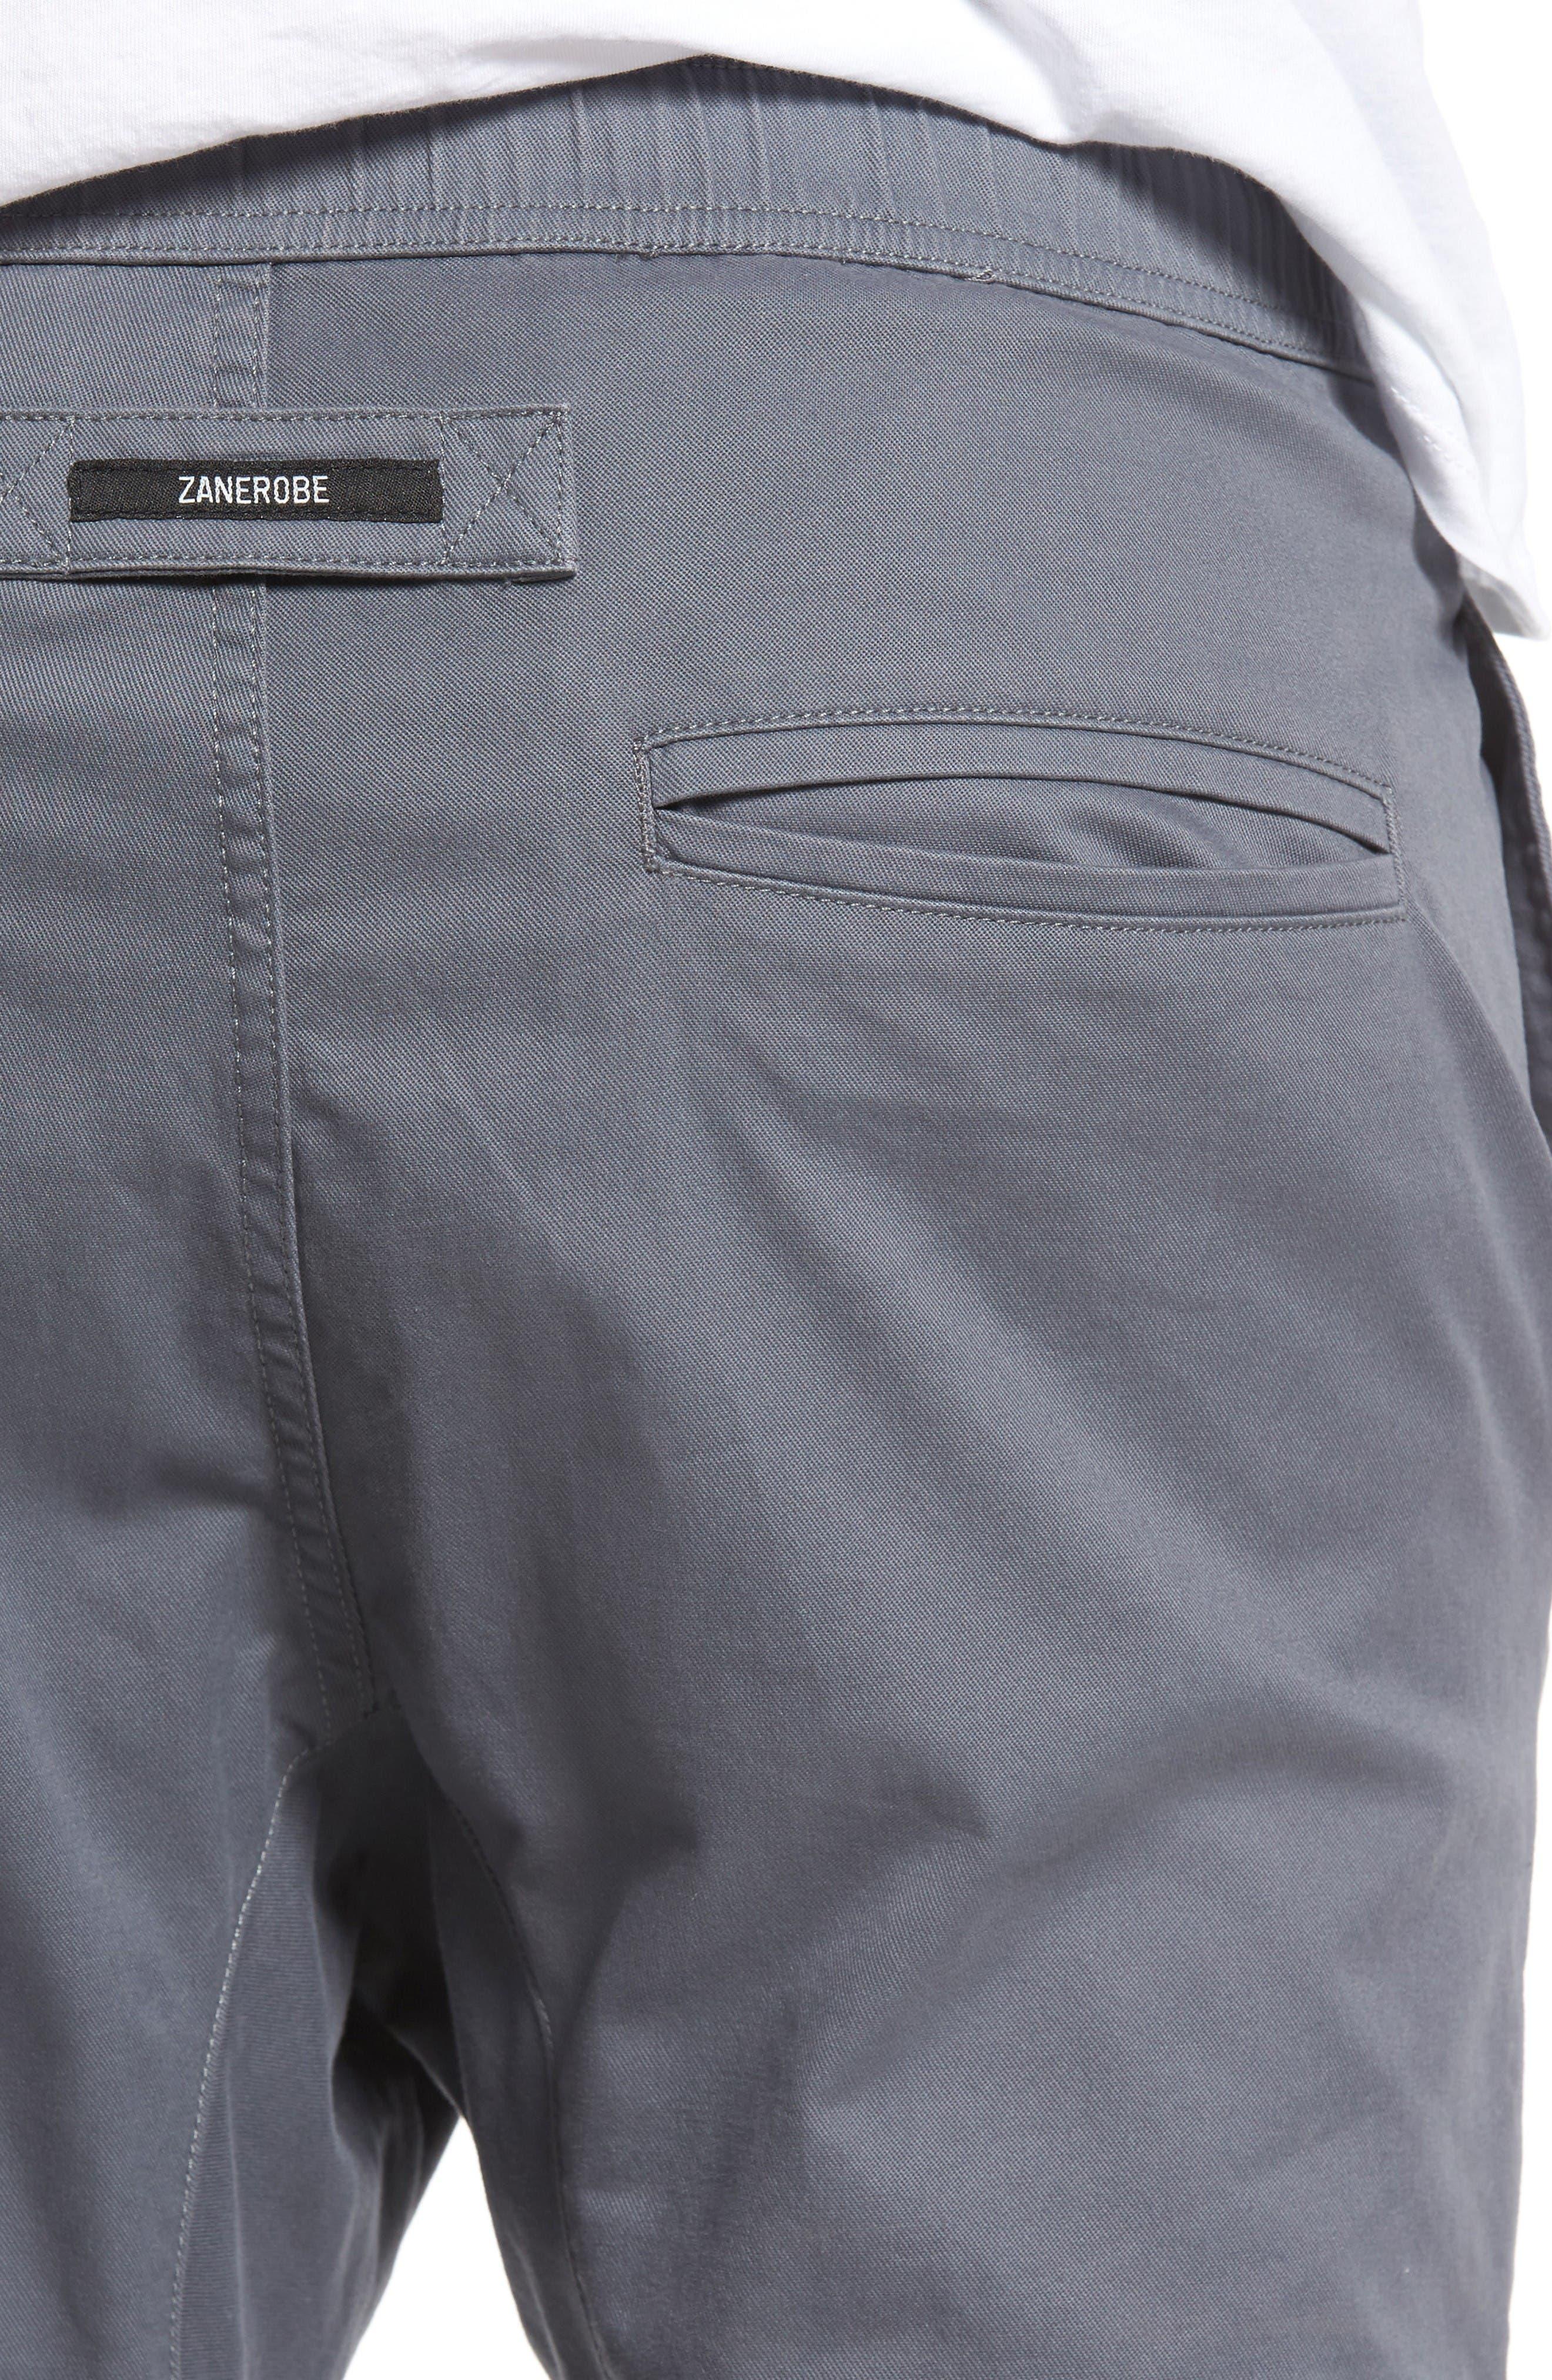 Salerno Stretch Woven Jogger Pants,                             Alternate thumbnail 4, color,                             Grey